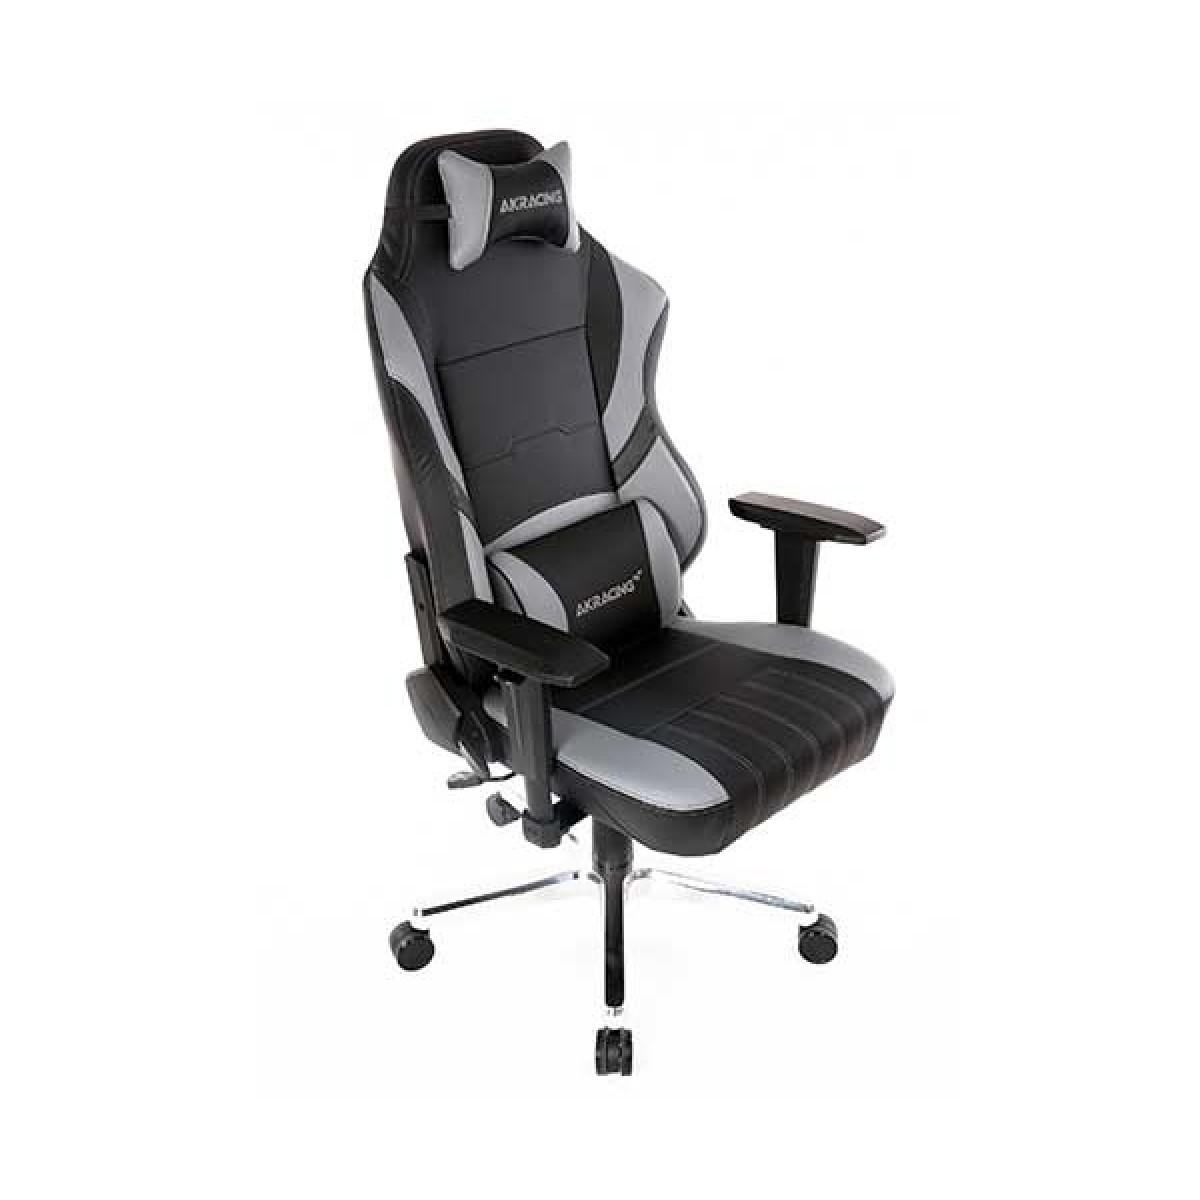 Cadeira Gamer AKRacing, Meraki, Reclinável, Preta/Cinza, 11068-6